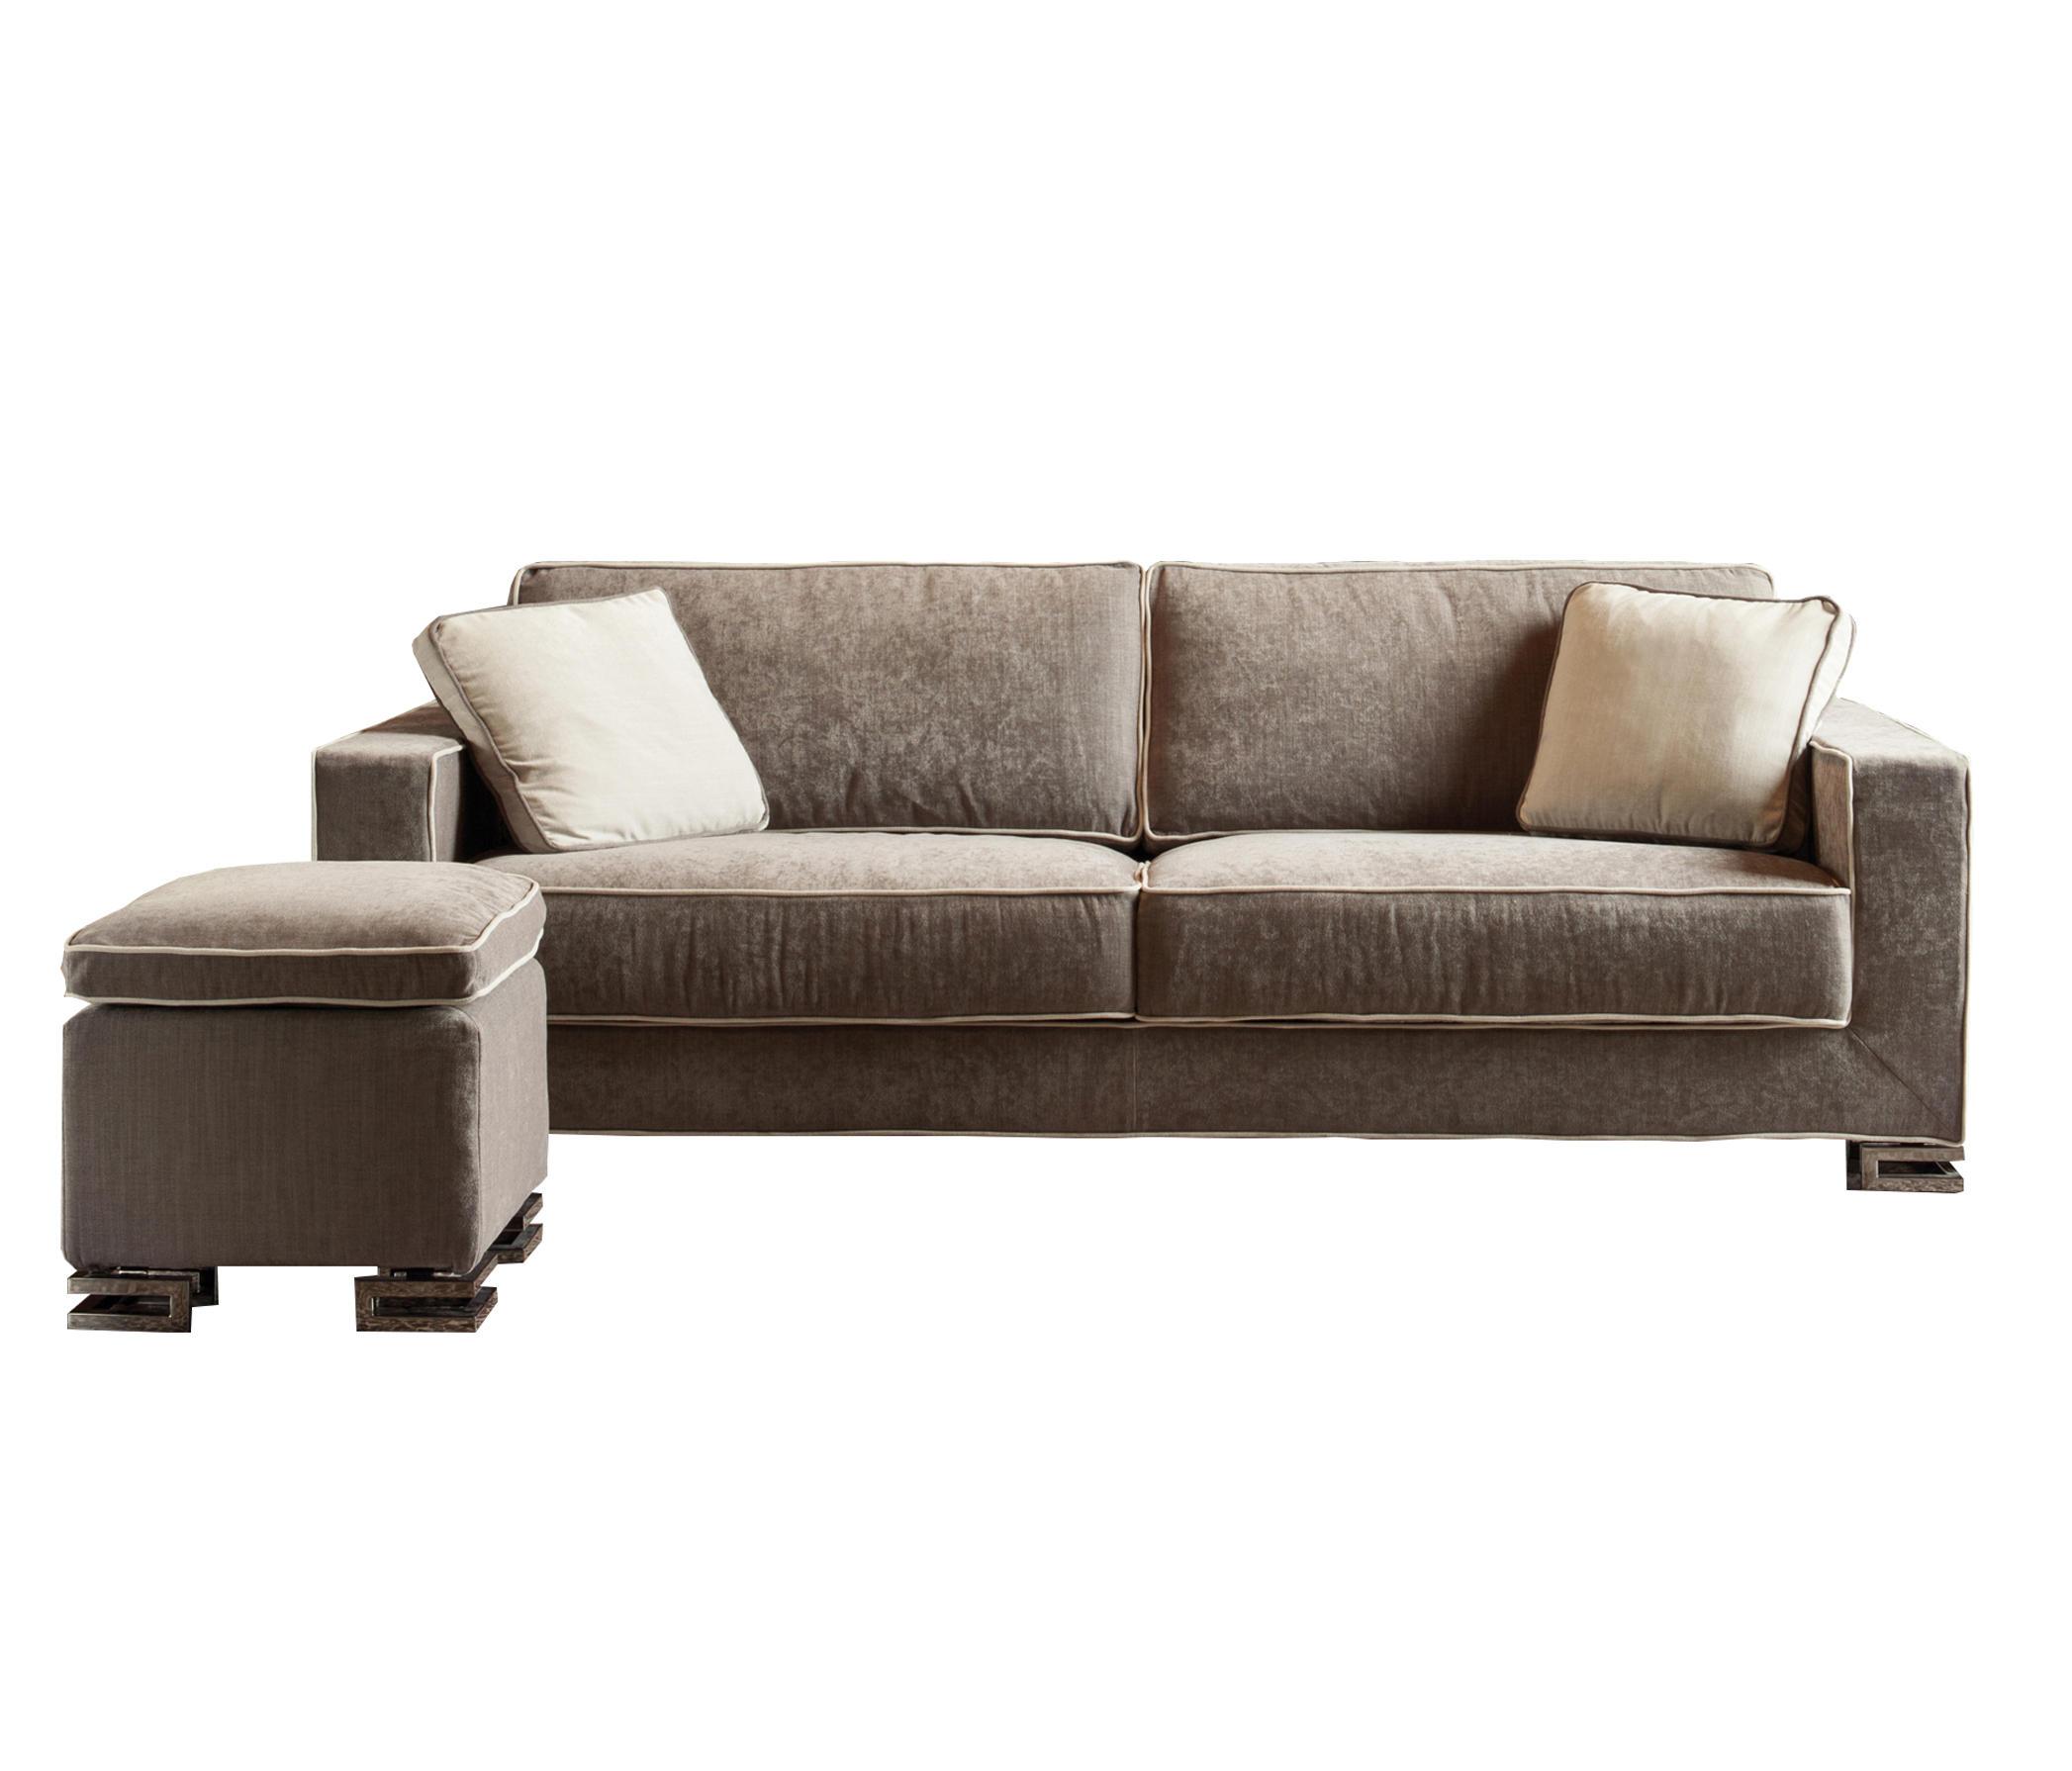 Garrison Sofas From Milano Bedding Architonic